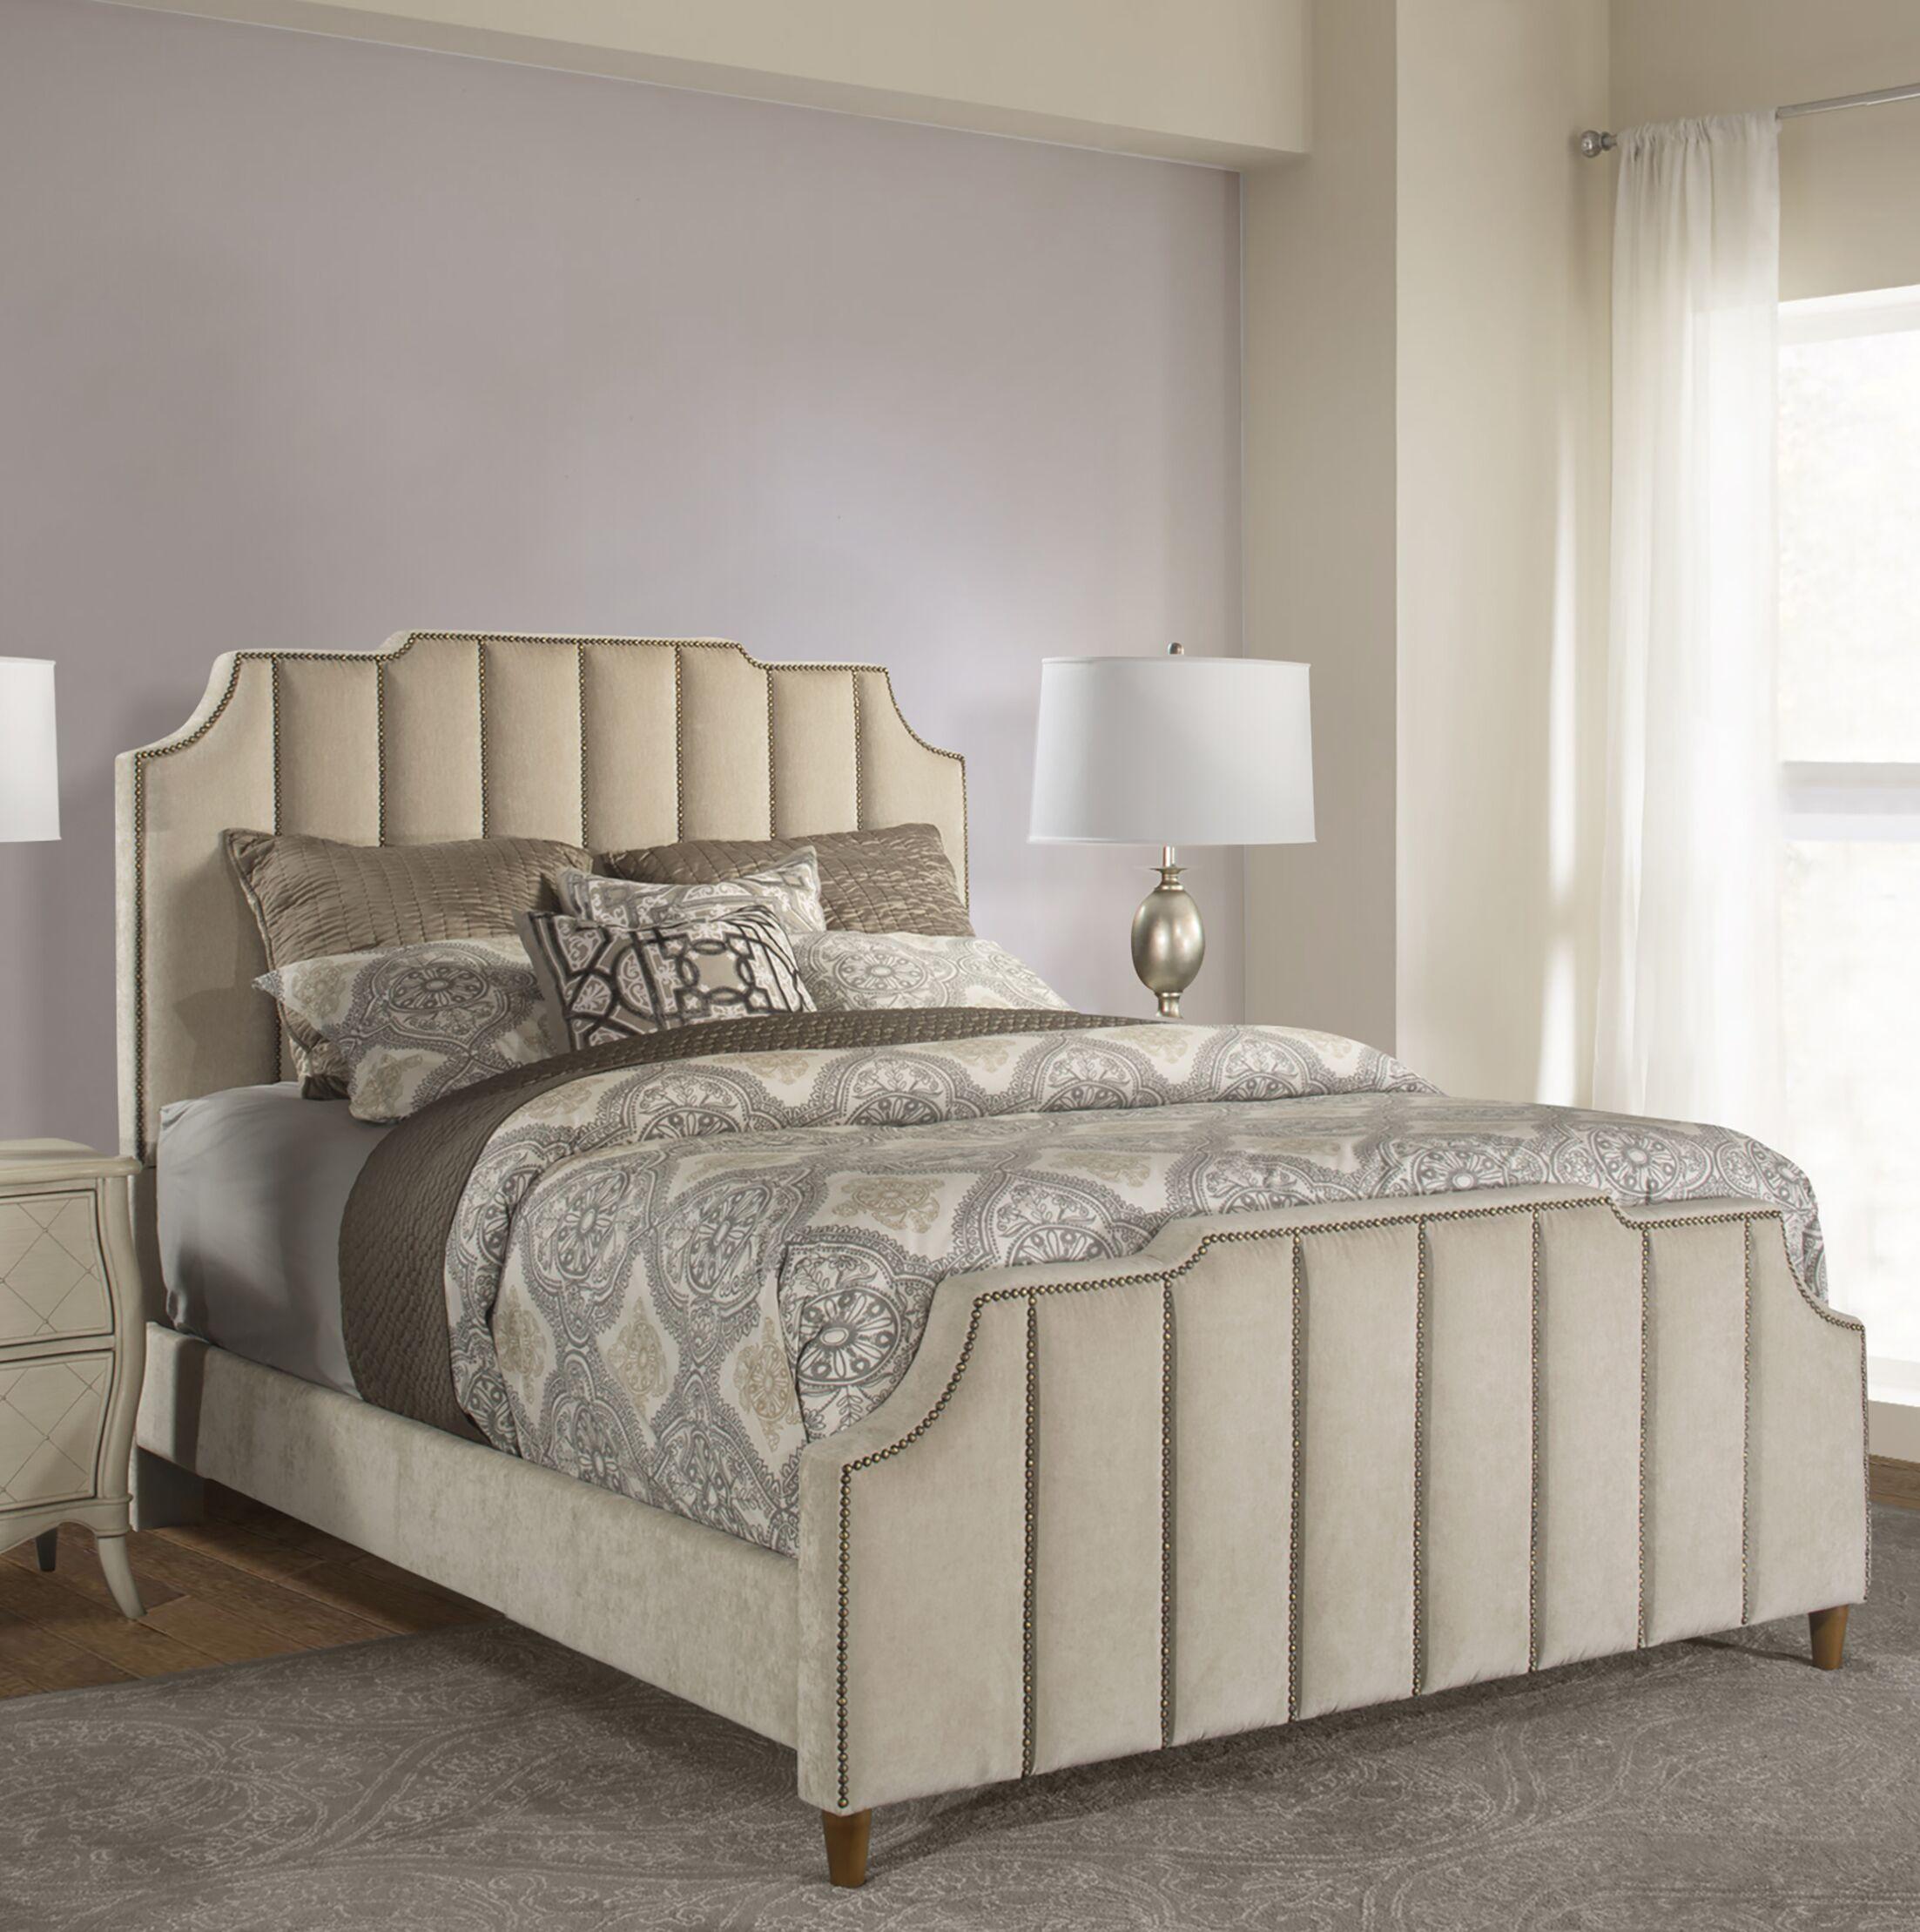 Atalaya Upholstered Platform Bed Size: Queen